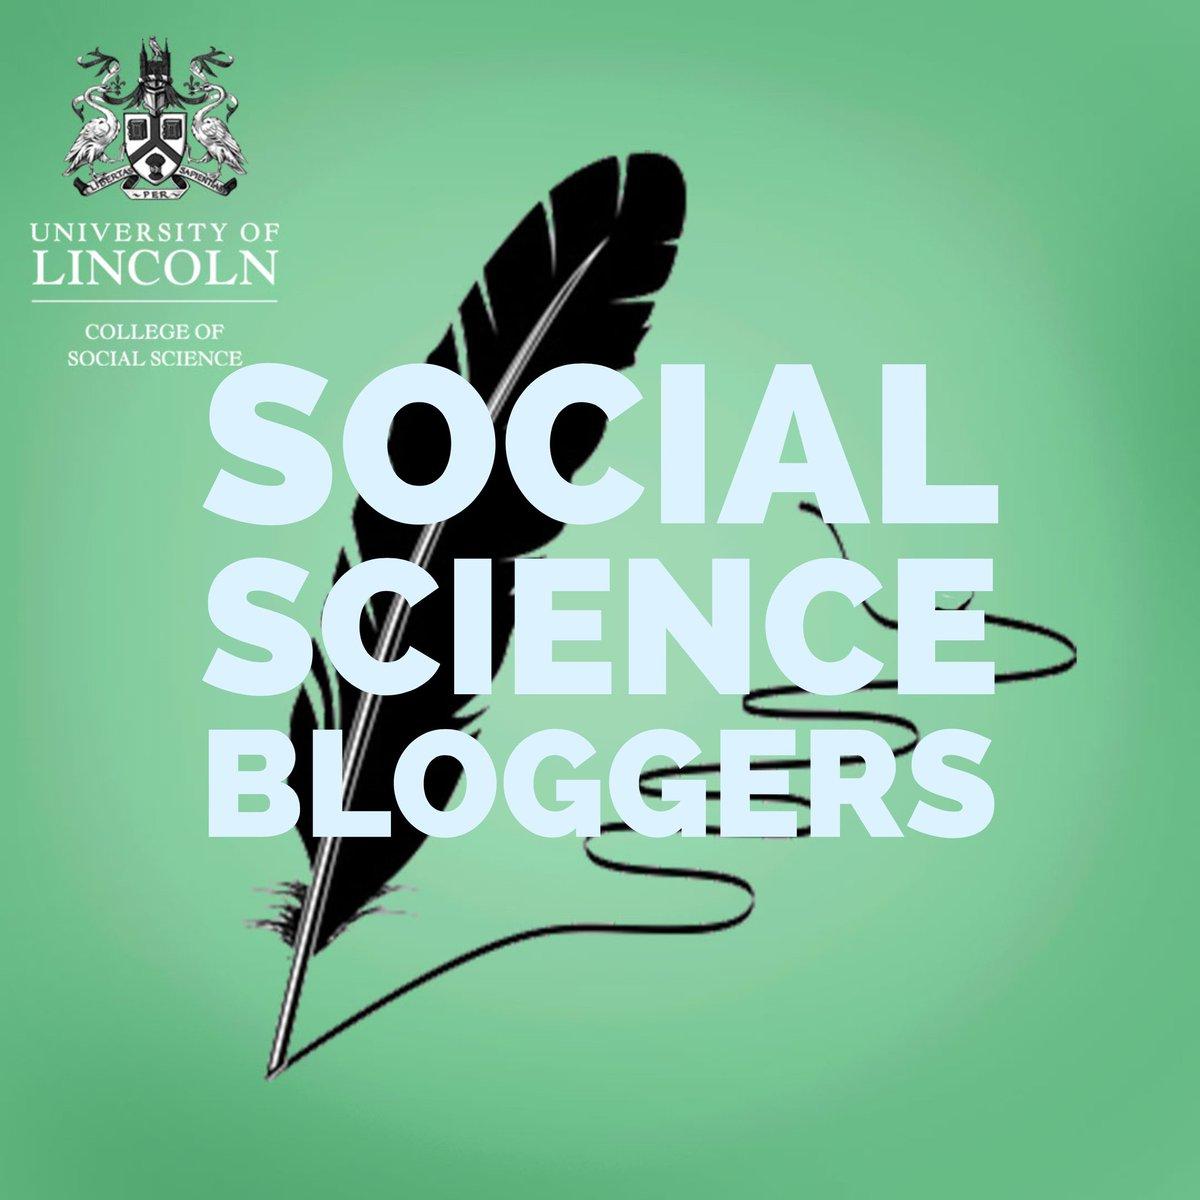 UOL Social Science on Twitter: